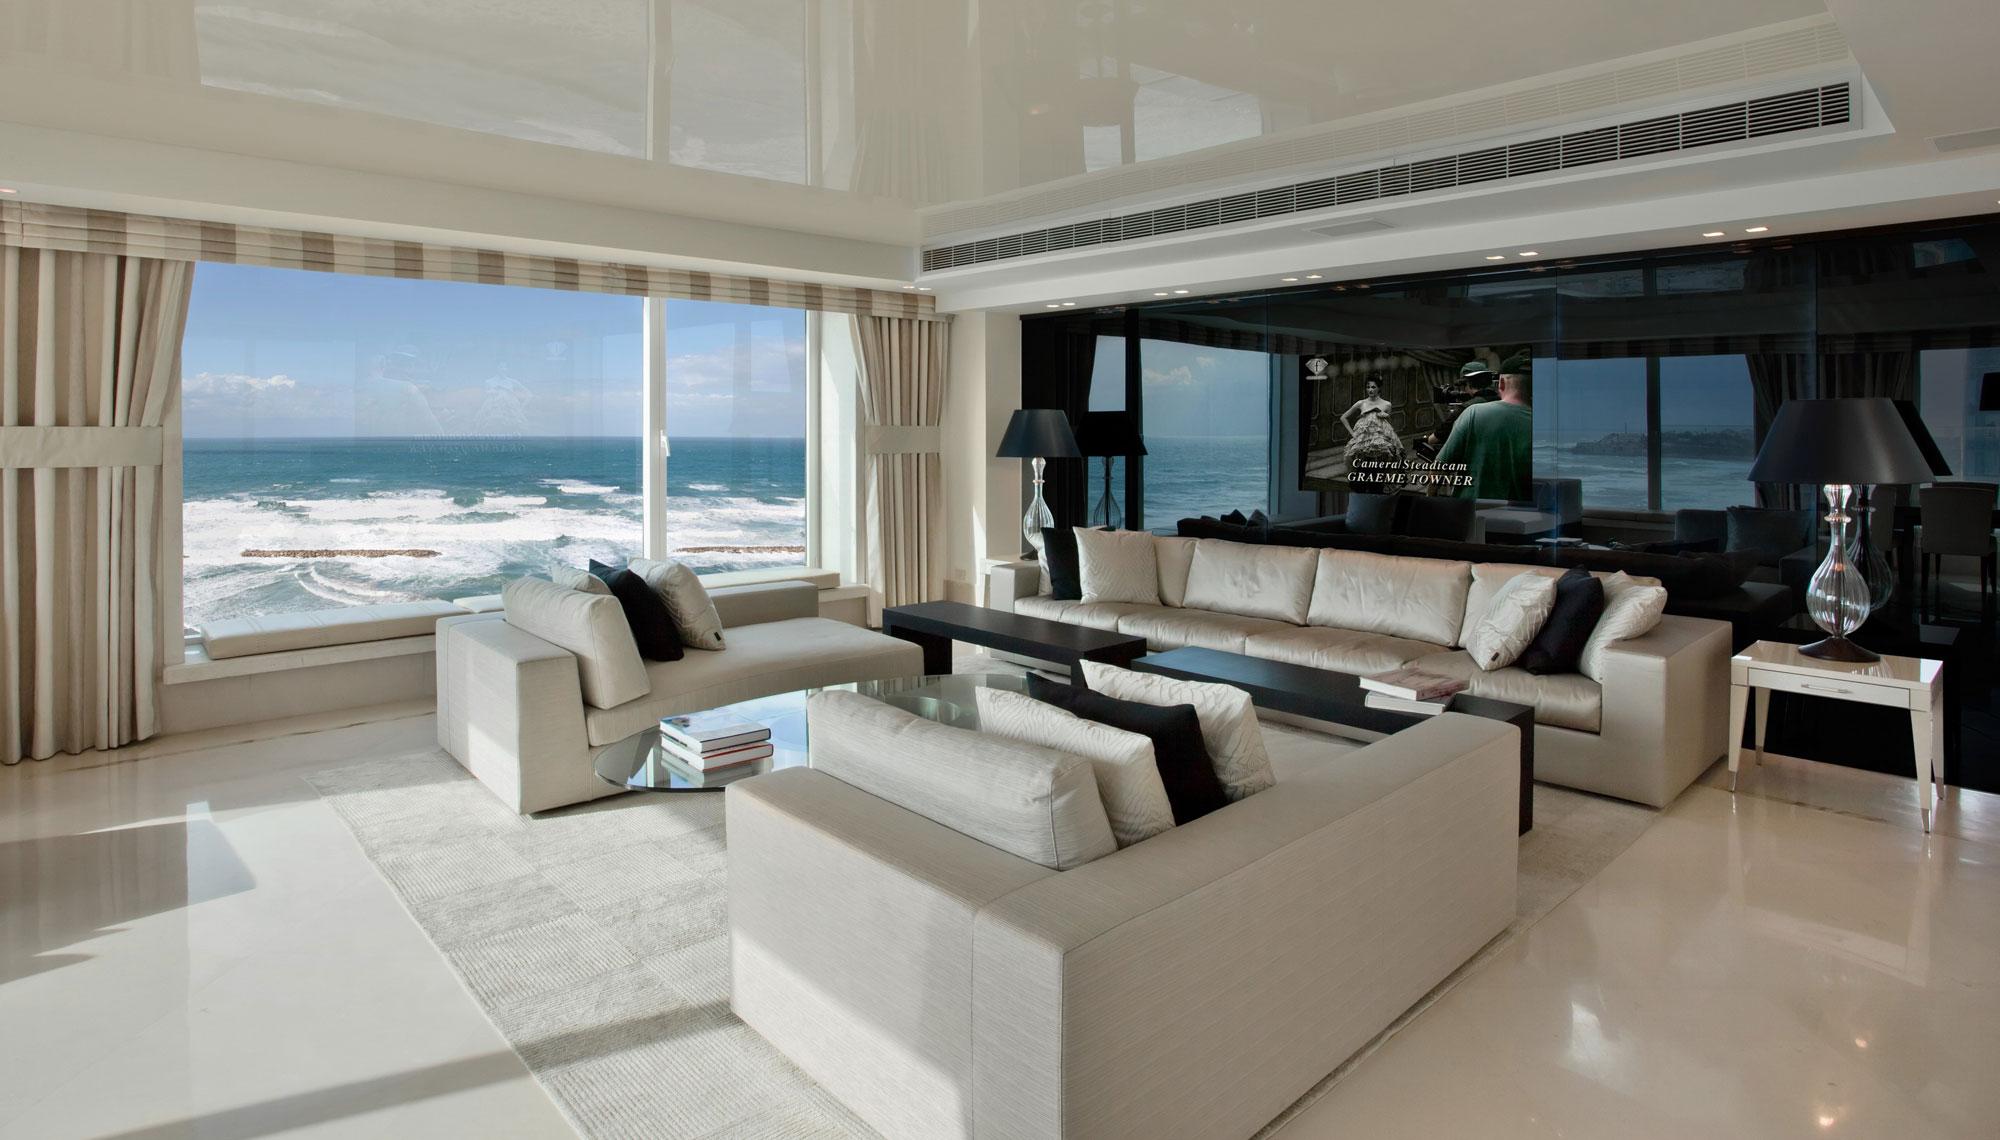 luxury apartment on the beach by daniel hasson homedezen